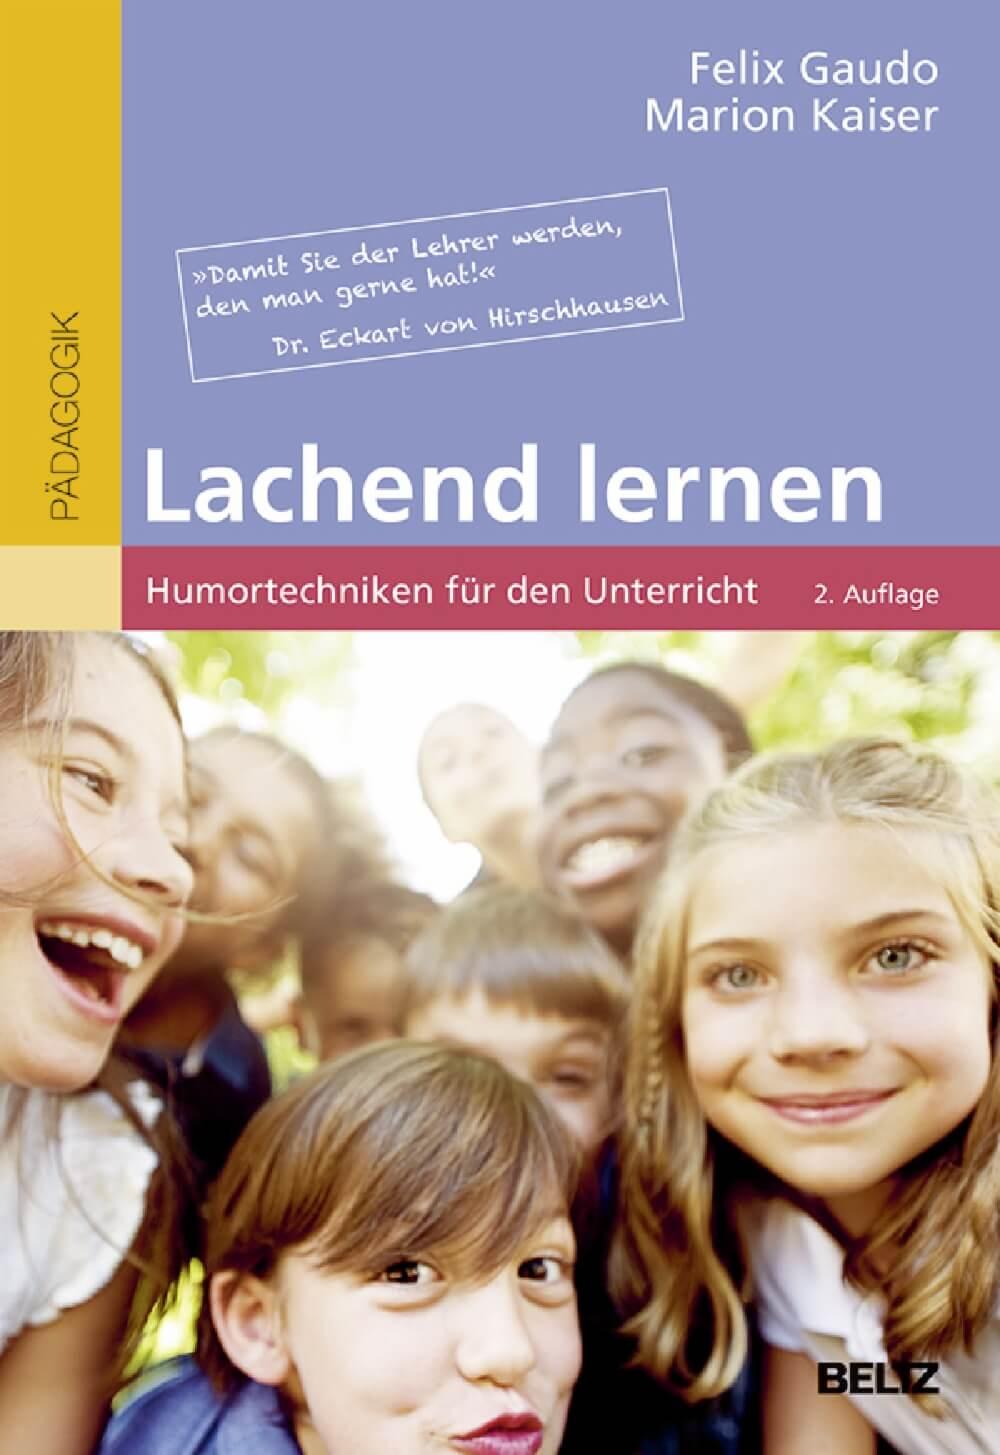 Lachende_lernen